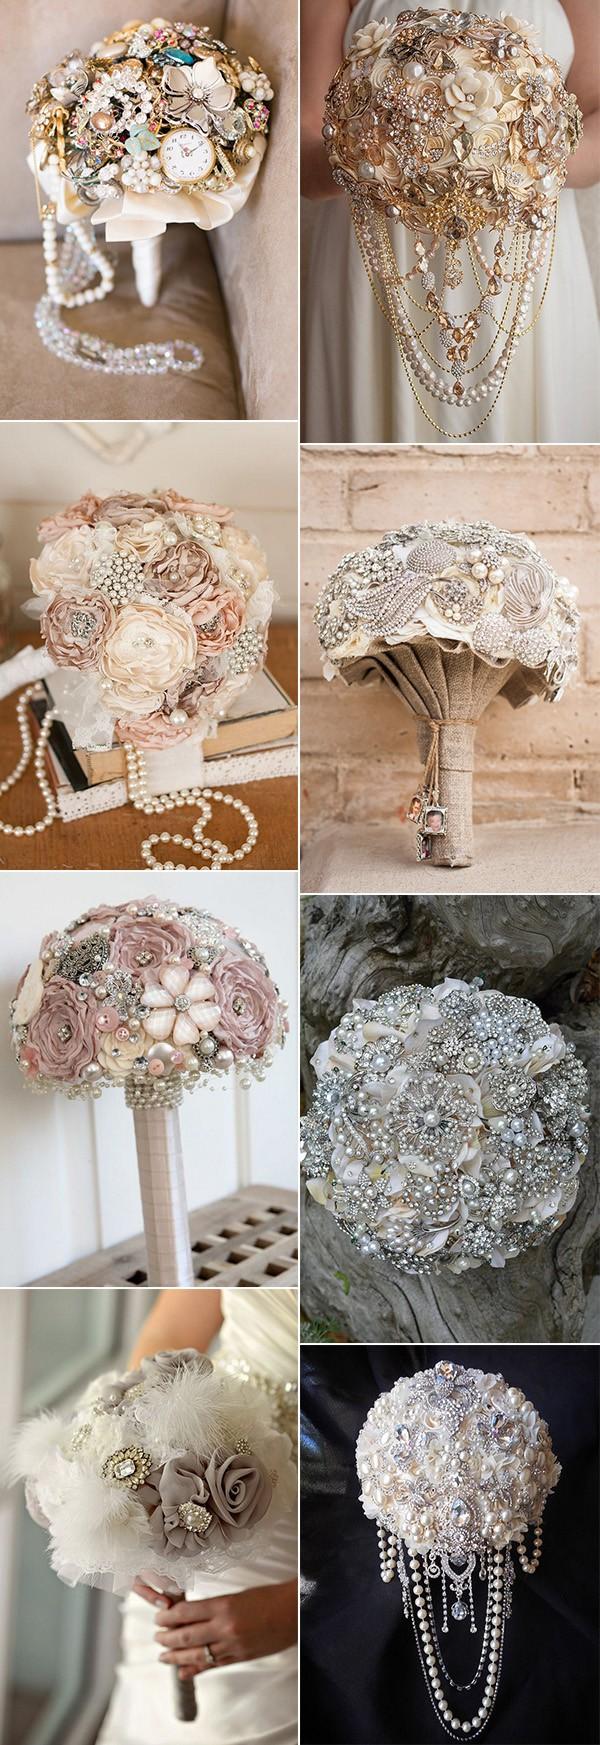 vintage brooch wedding bouquet ideas for 2018